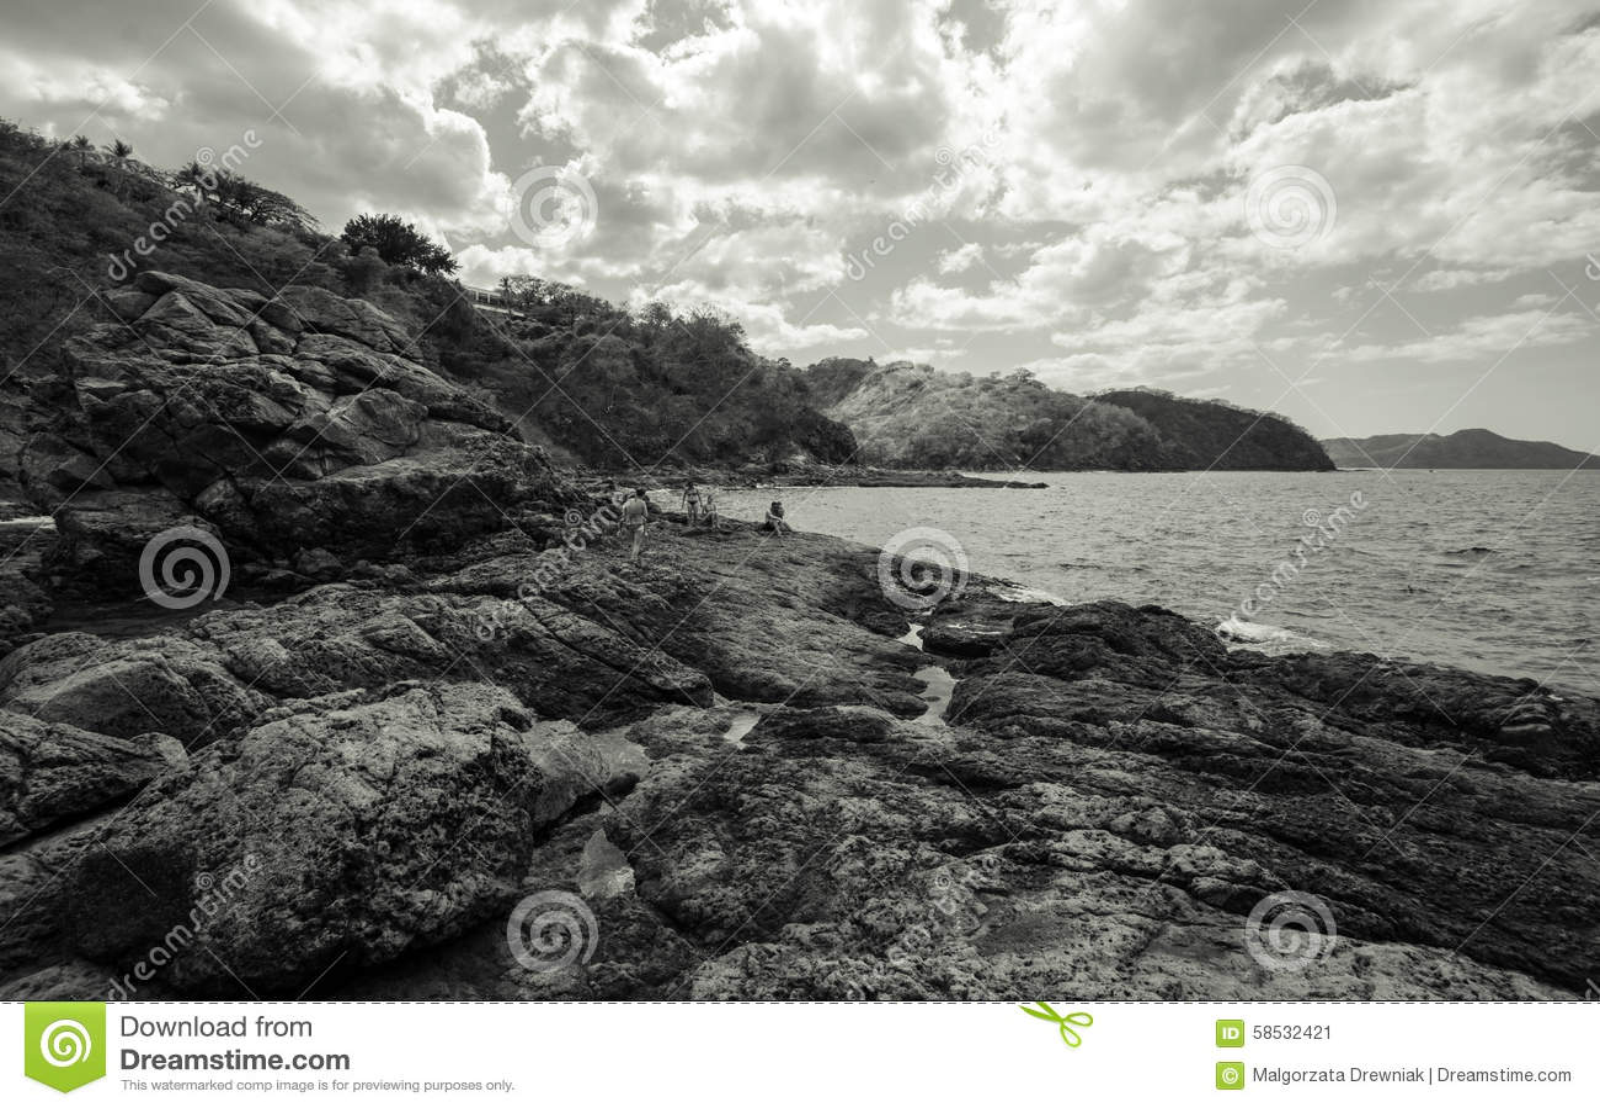 Ocotal beach in guanacaste costa rica editorial photo for Black sand beaches costa rica